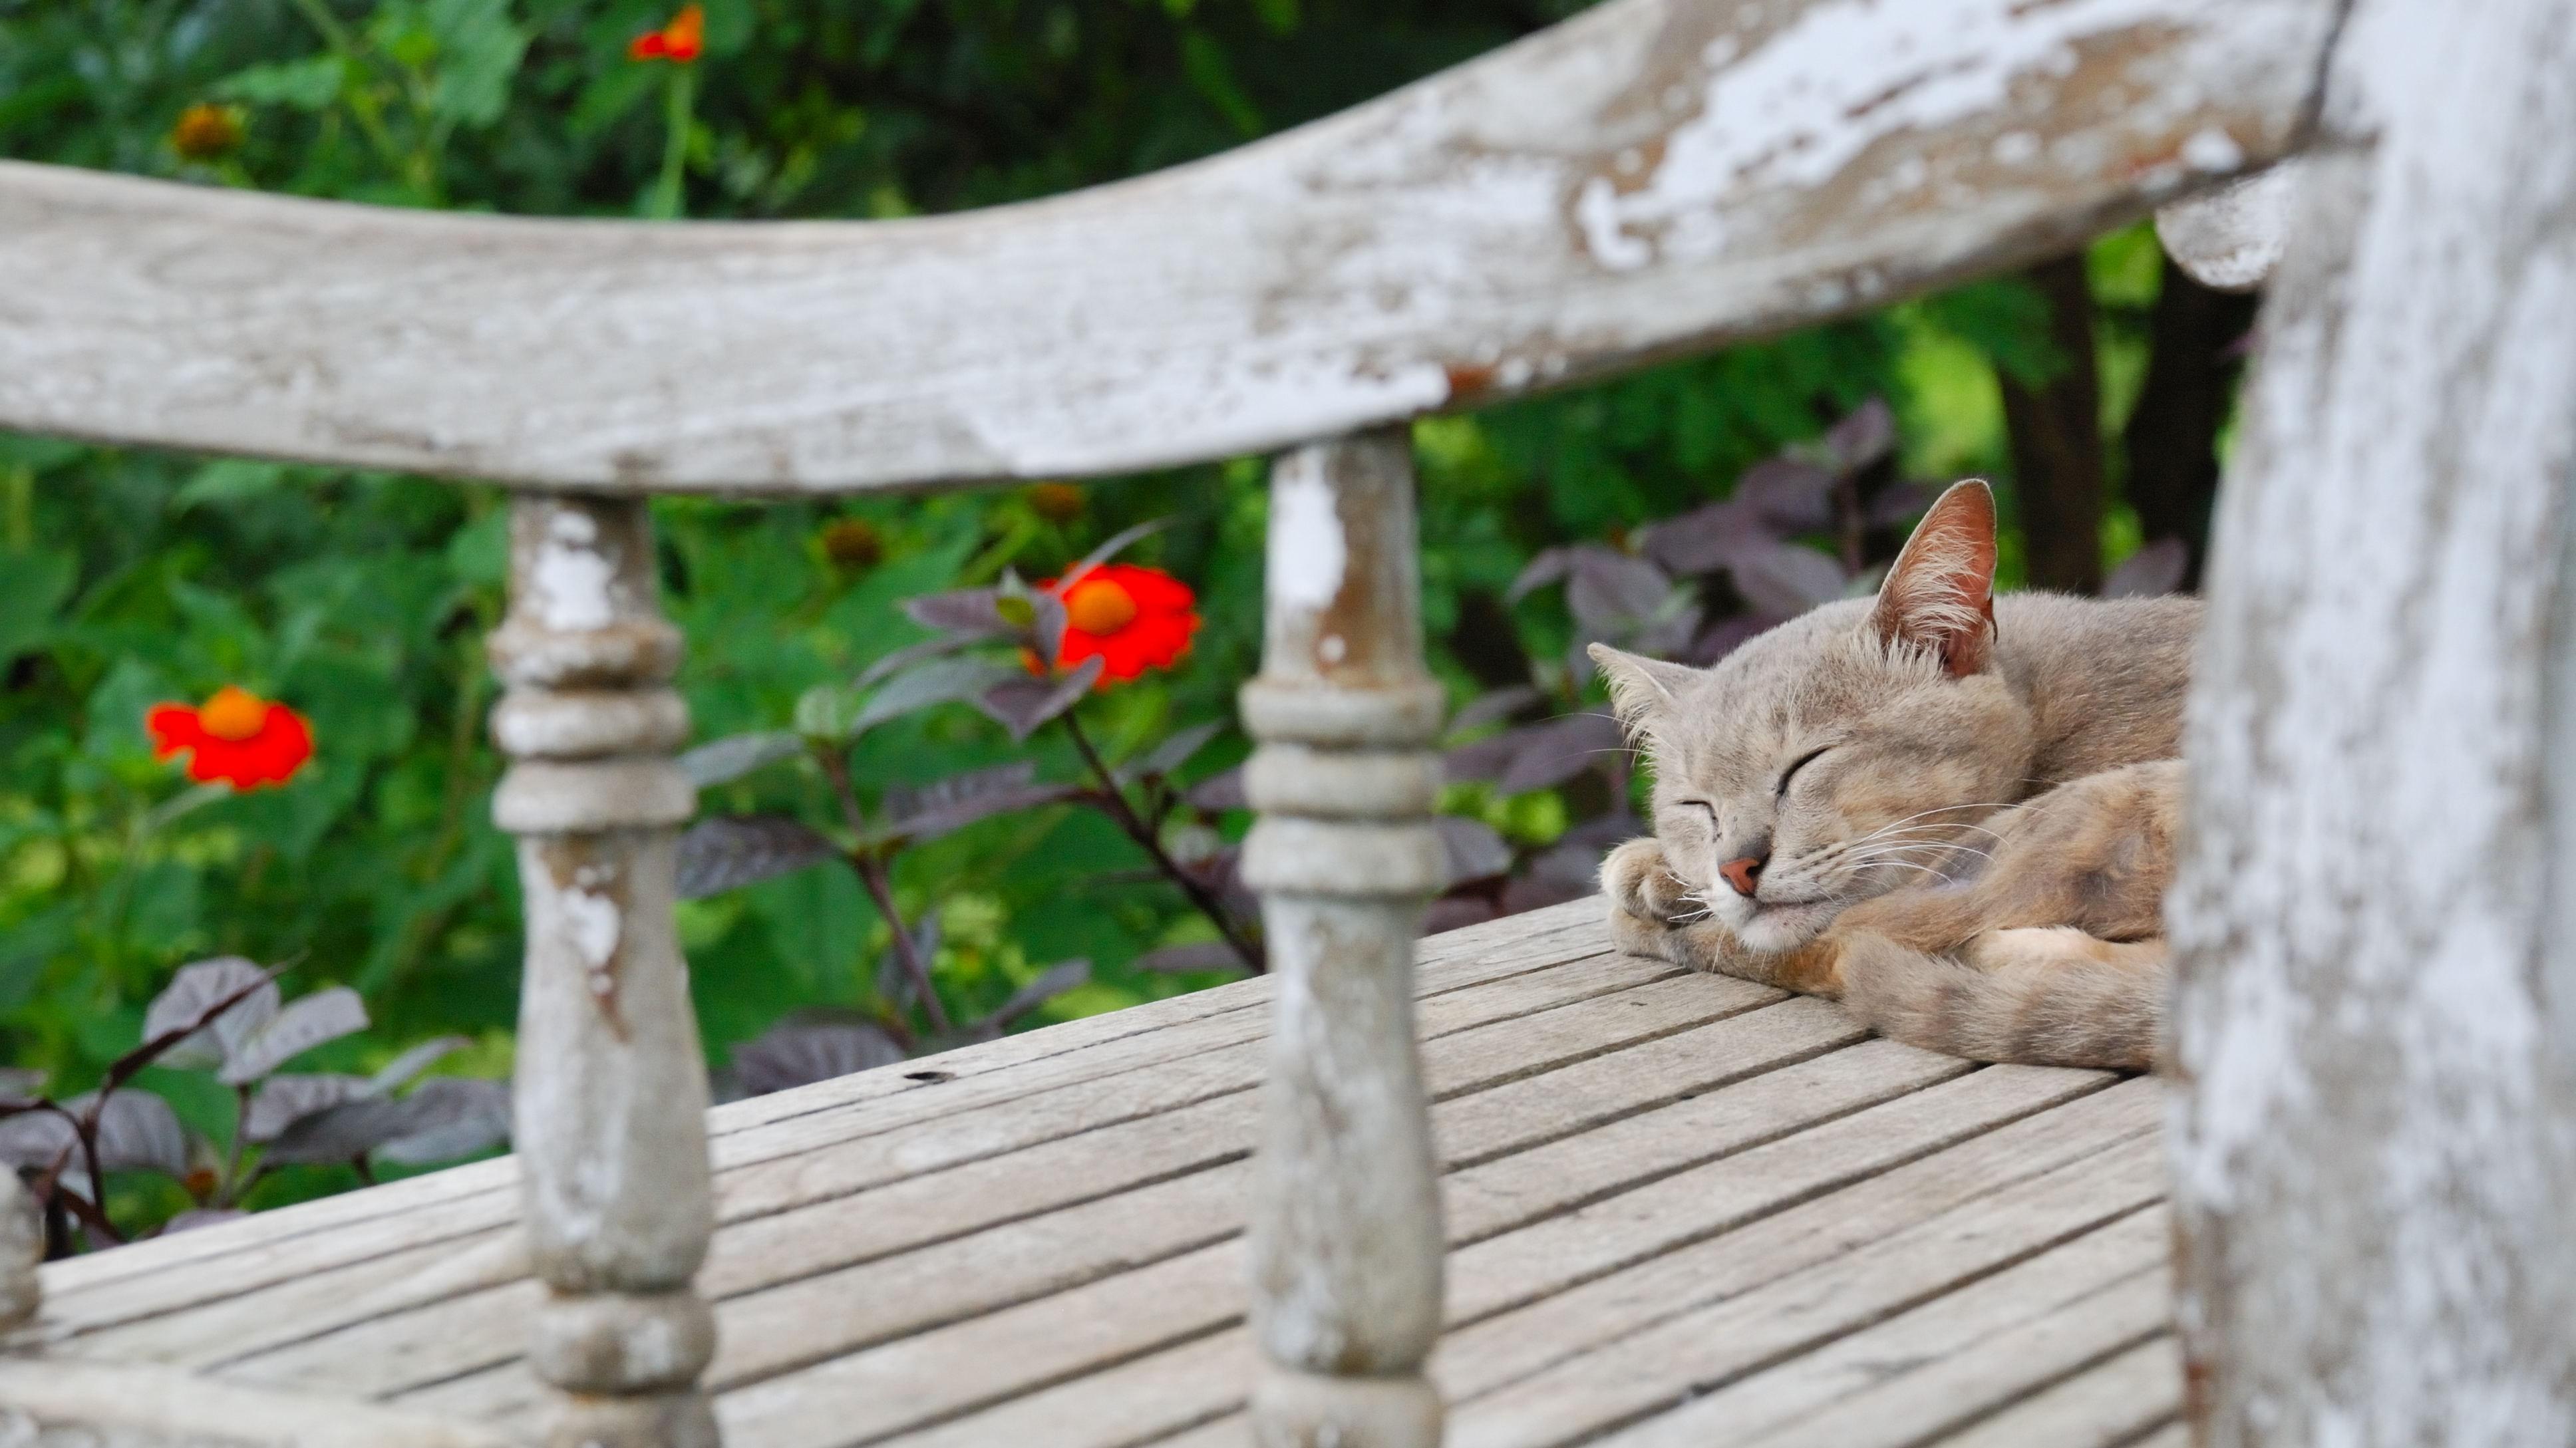 Short-fur gray cat sleeping on gray wooden surface photo